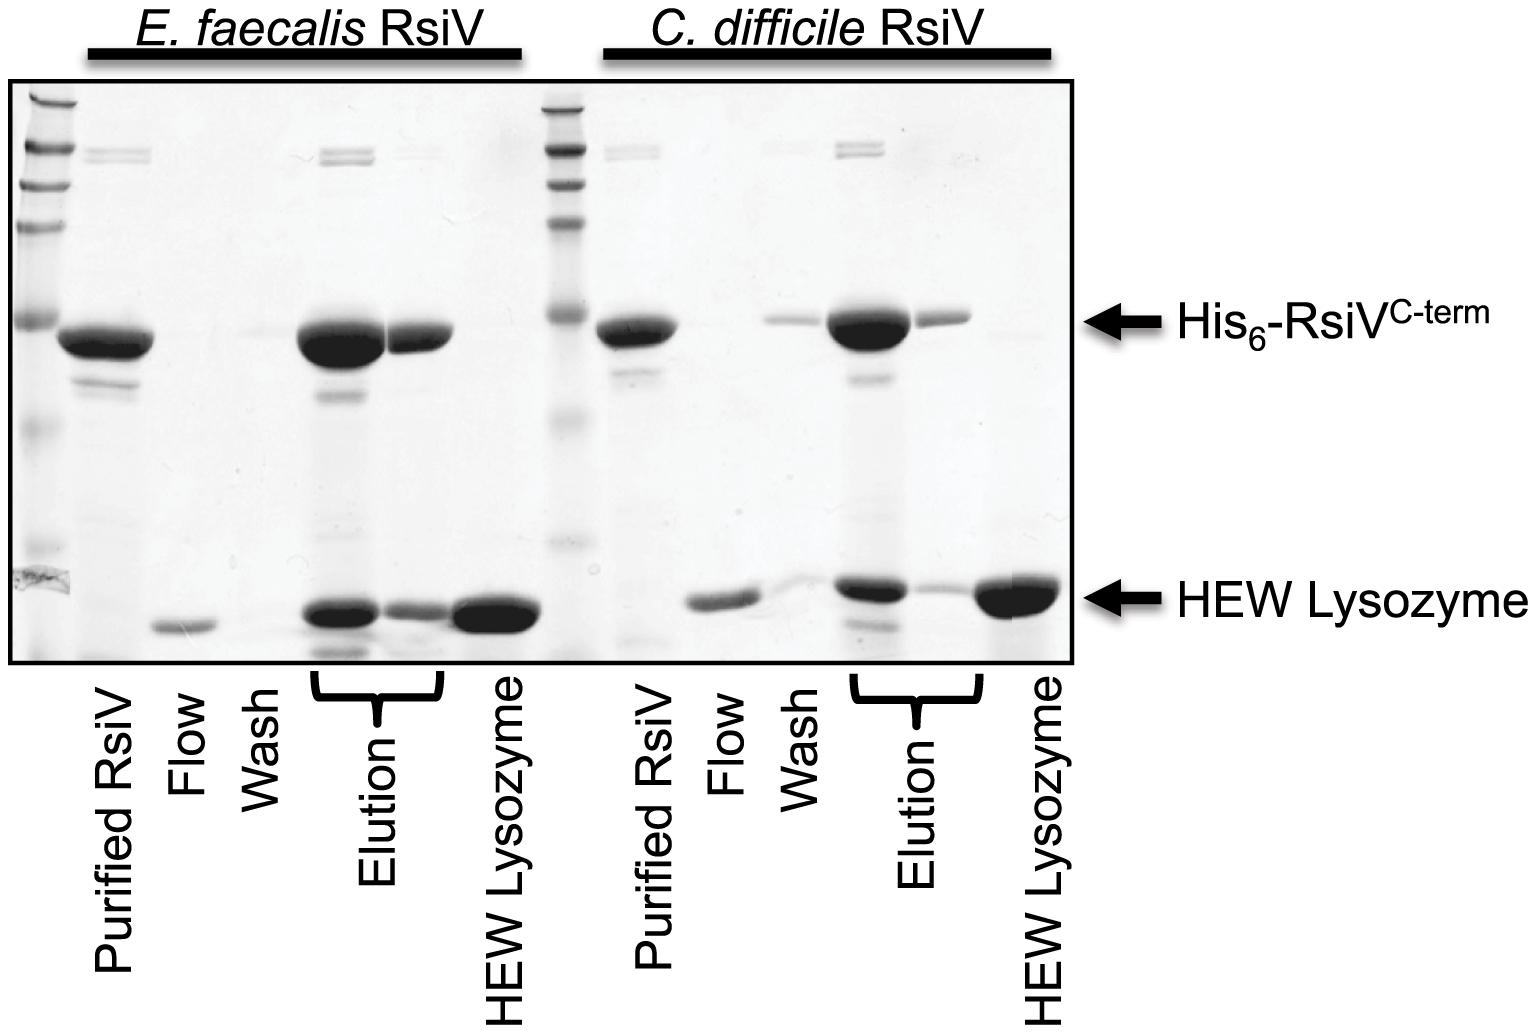 Extracellular domain of RsiV from <i>C. difficile</i> and <i>E. faecalis</i> RsiV bind lysozyme.